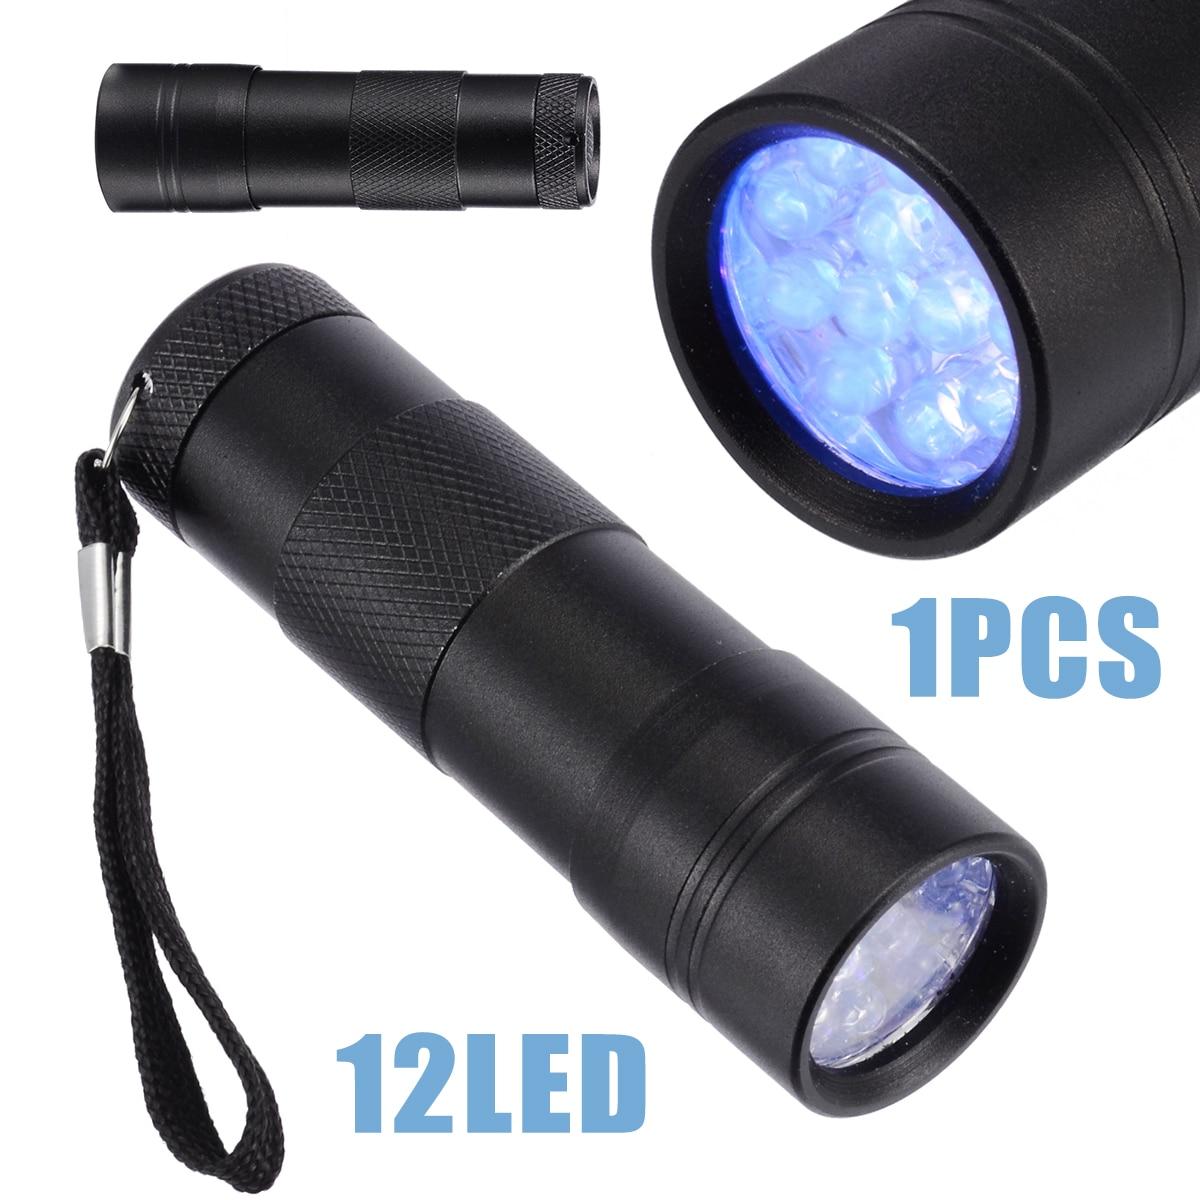 UV GEL Curing Light Black Professional Light 12 LED Ultraviolet Flashlight 395nm Torch For UV Resin Craft Battery